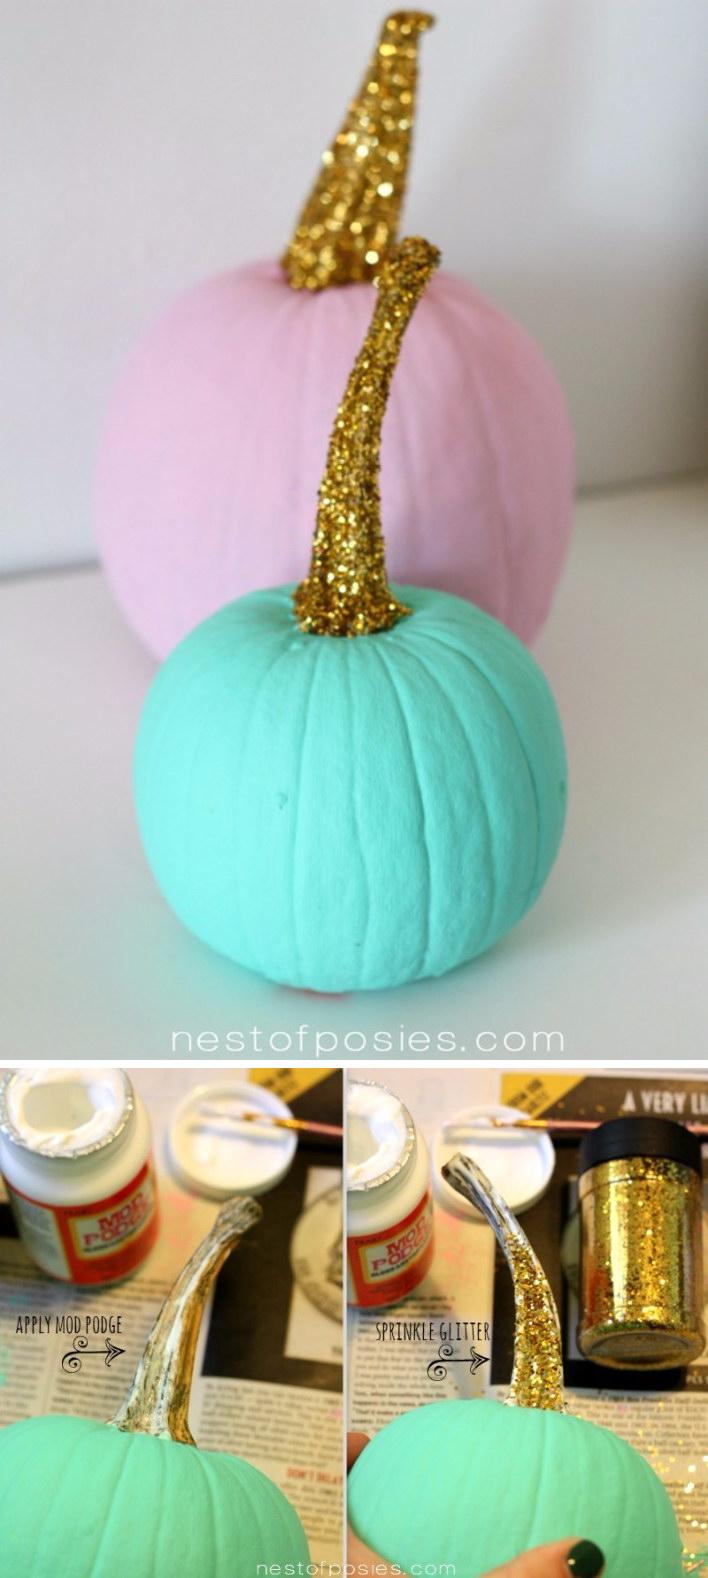 40+ Cool No-Carve Pumpkin Decorating Ideas - Hative